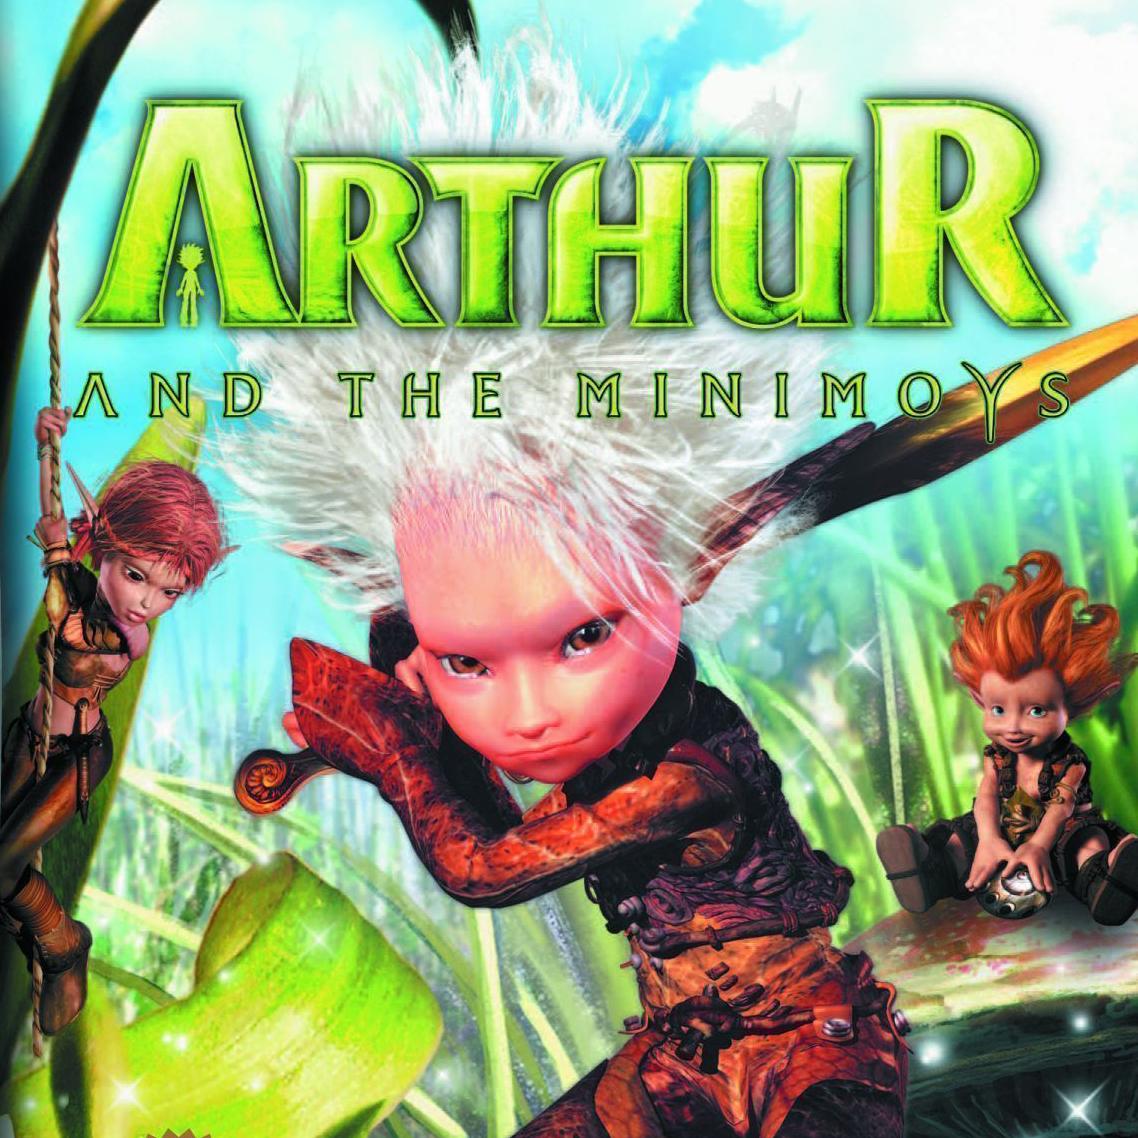 Play Arthur And The Minimoys On Gba Emulator Online